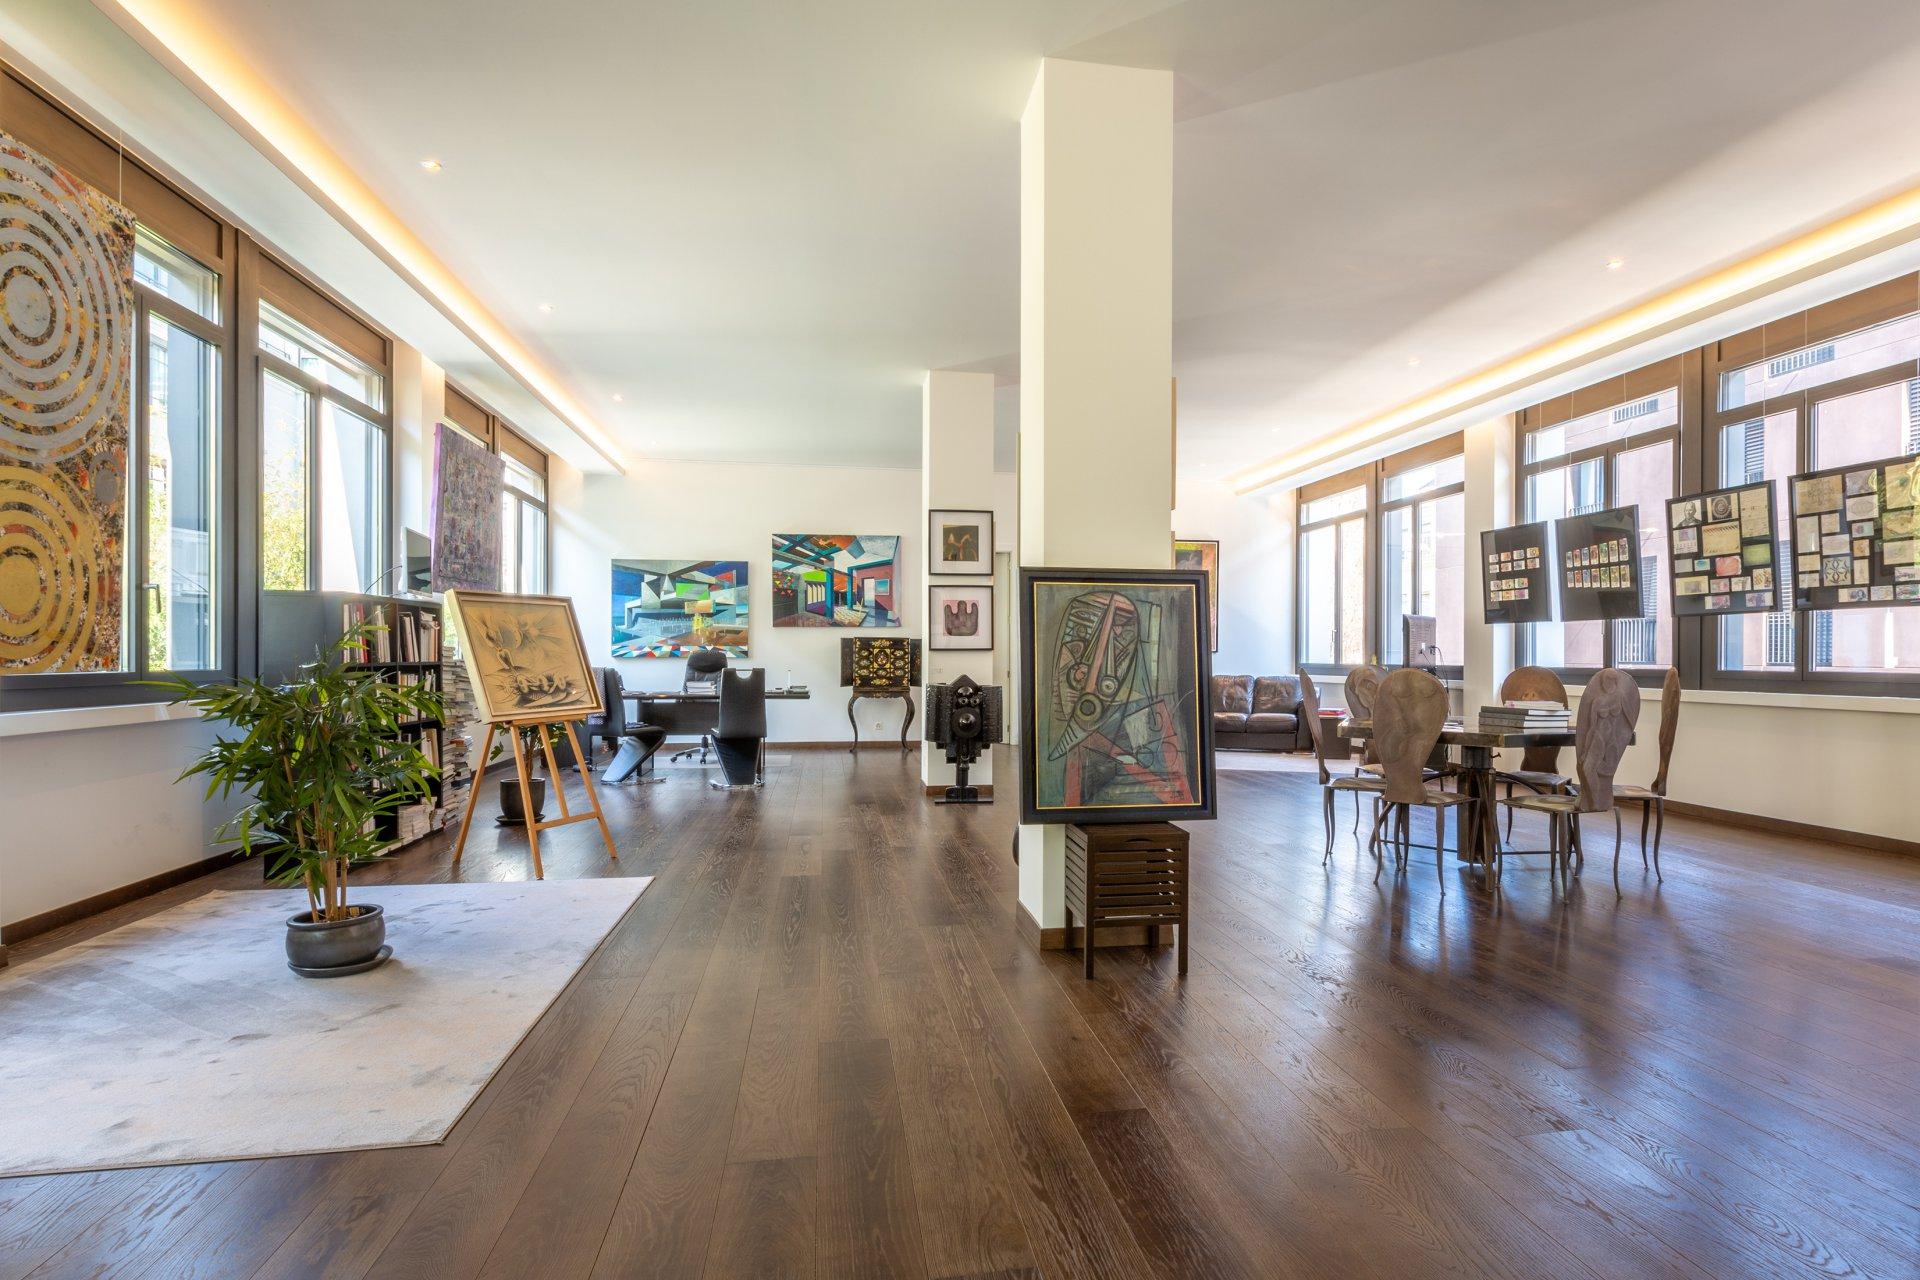 acheter appartement geneve suisse : Infos et ressources